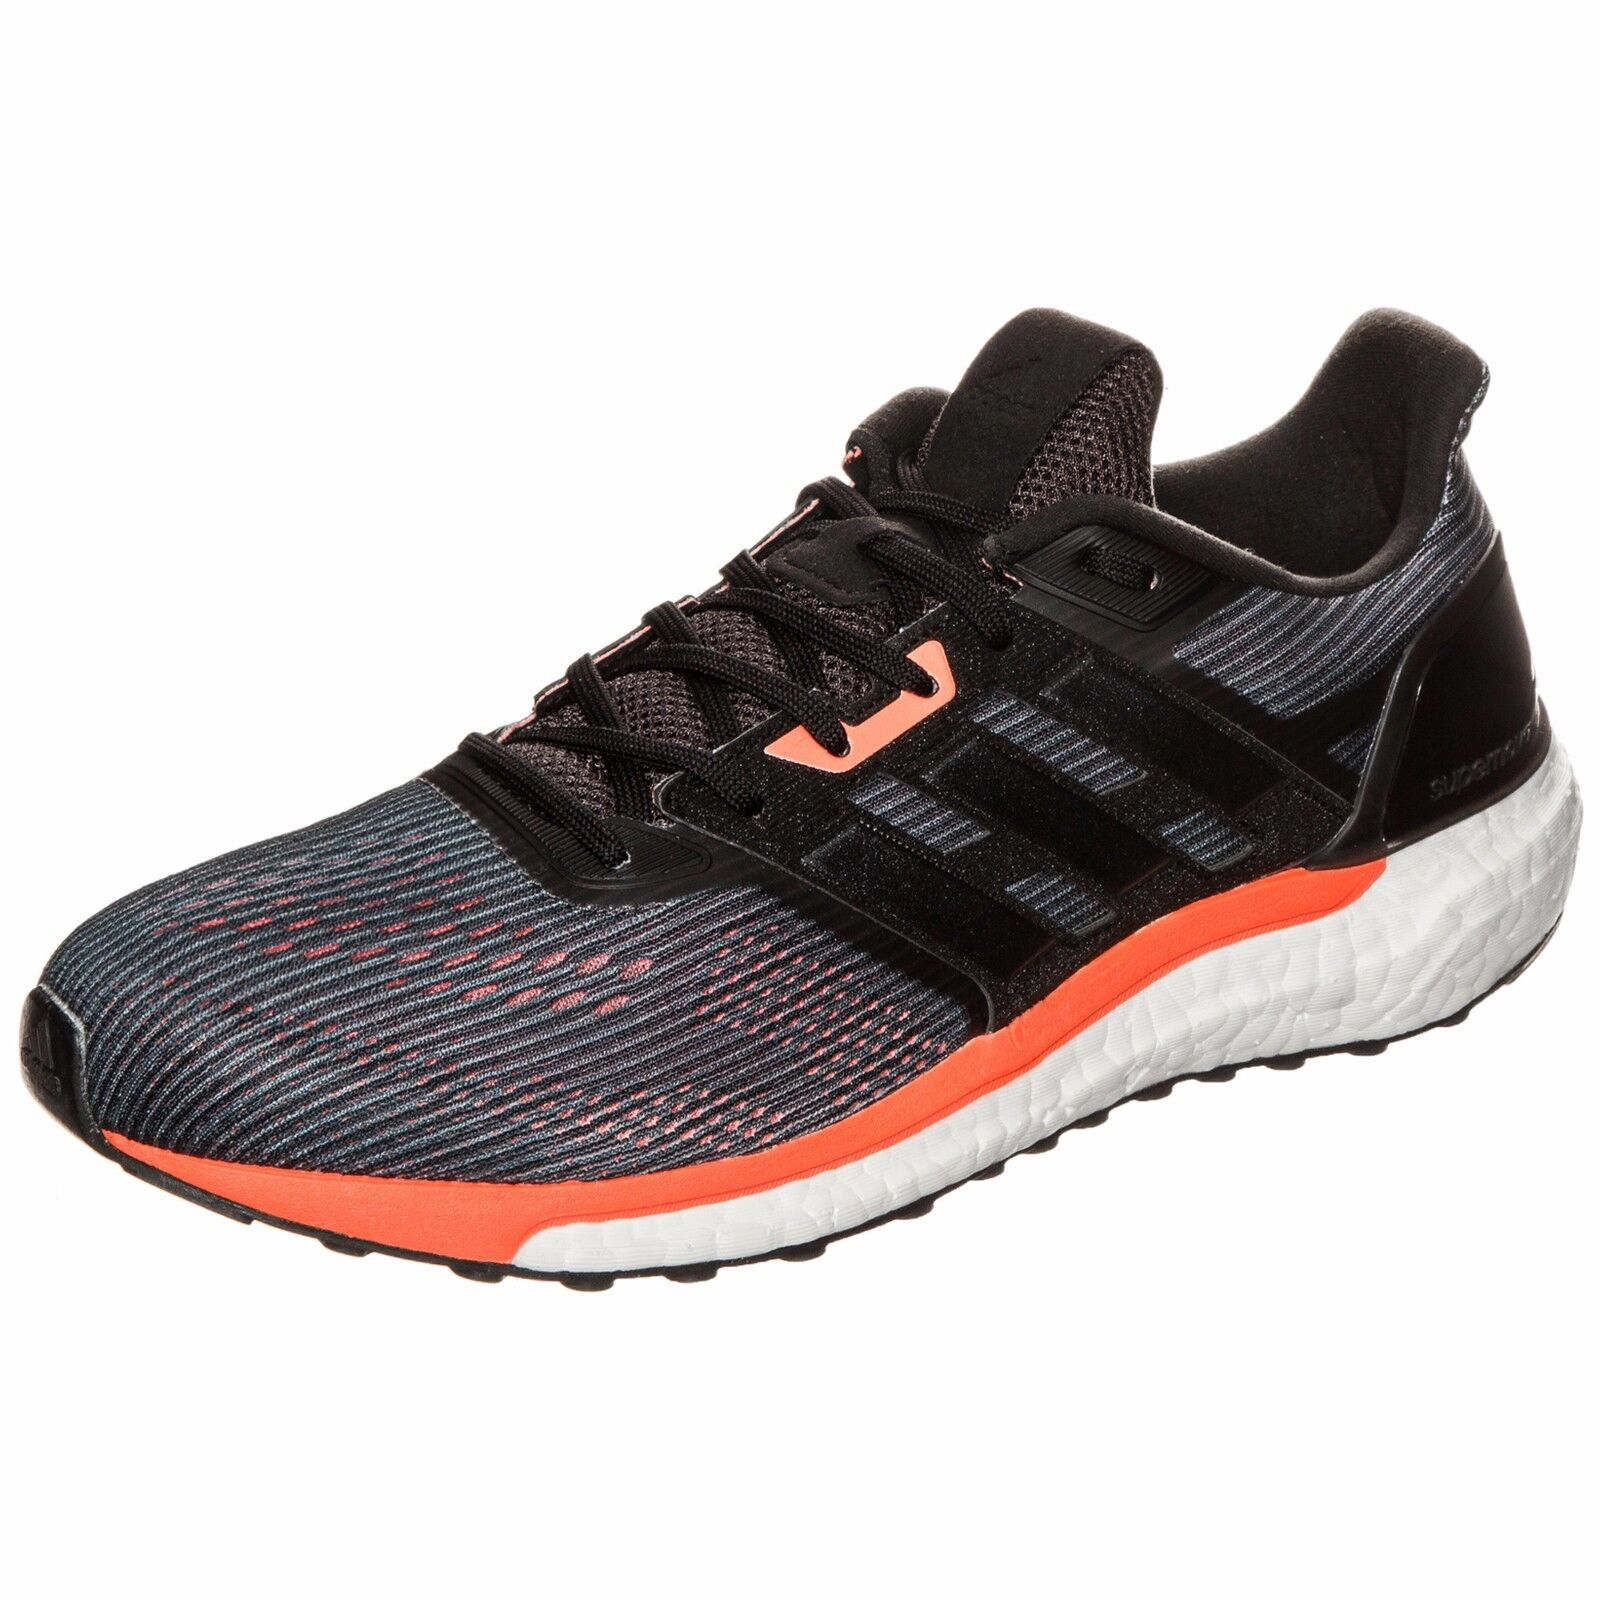 Adidas Men's Supernova Running Shoes Utility Black/Black BB3473 Sz 8 - - 8 13 73e85c